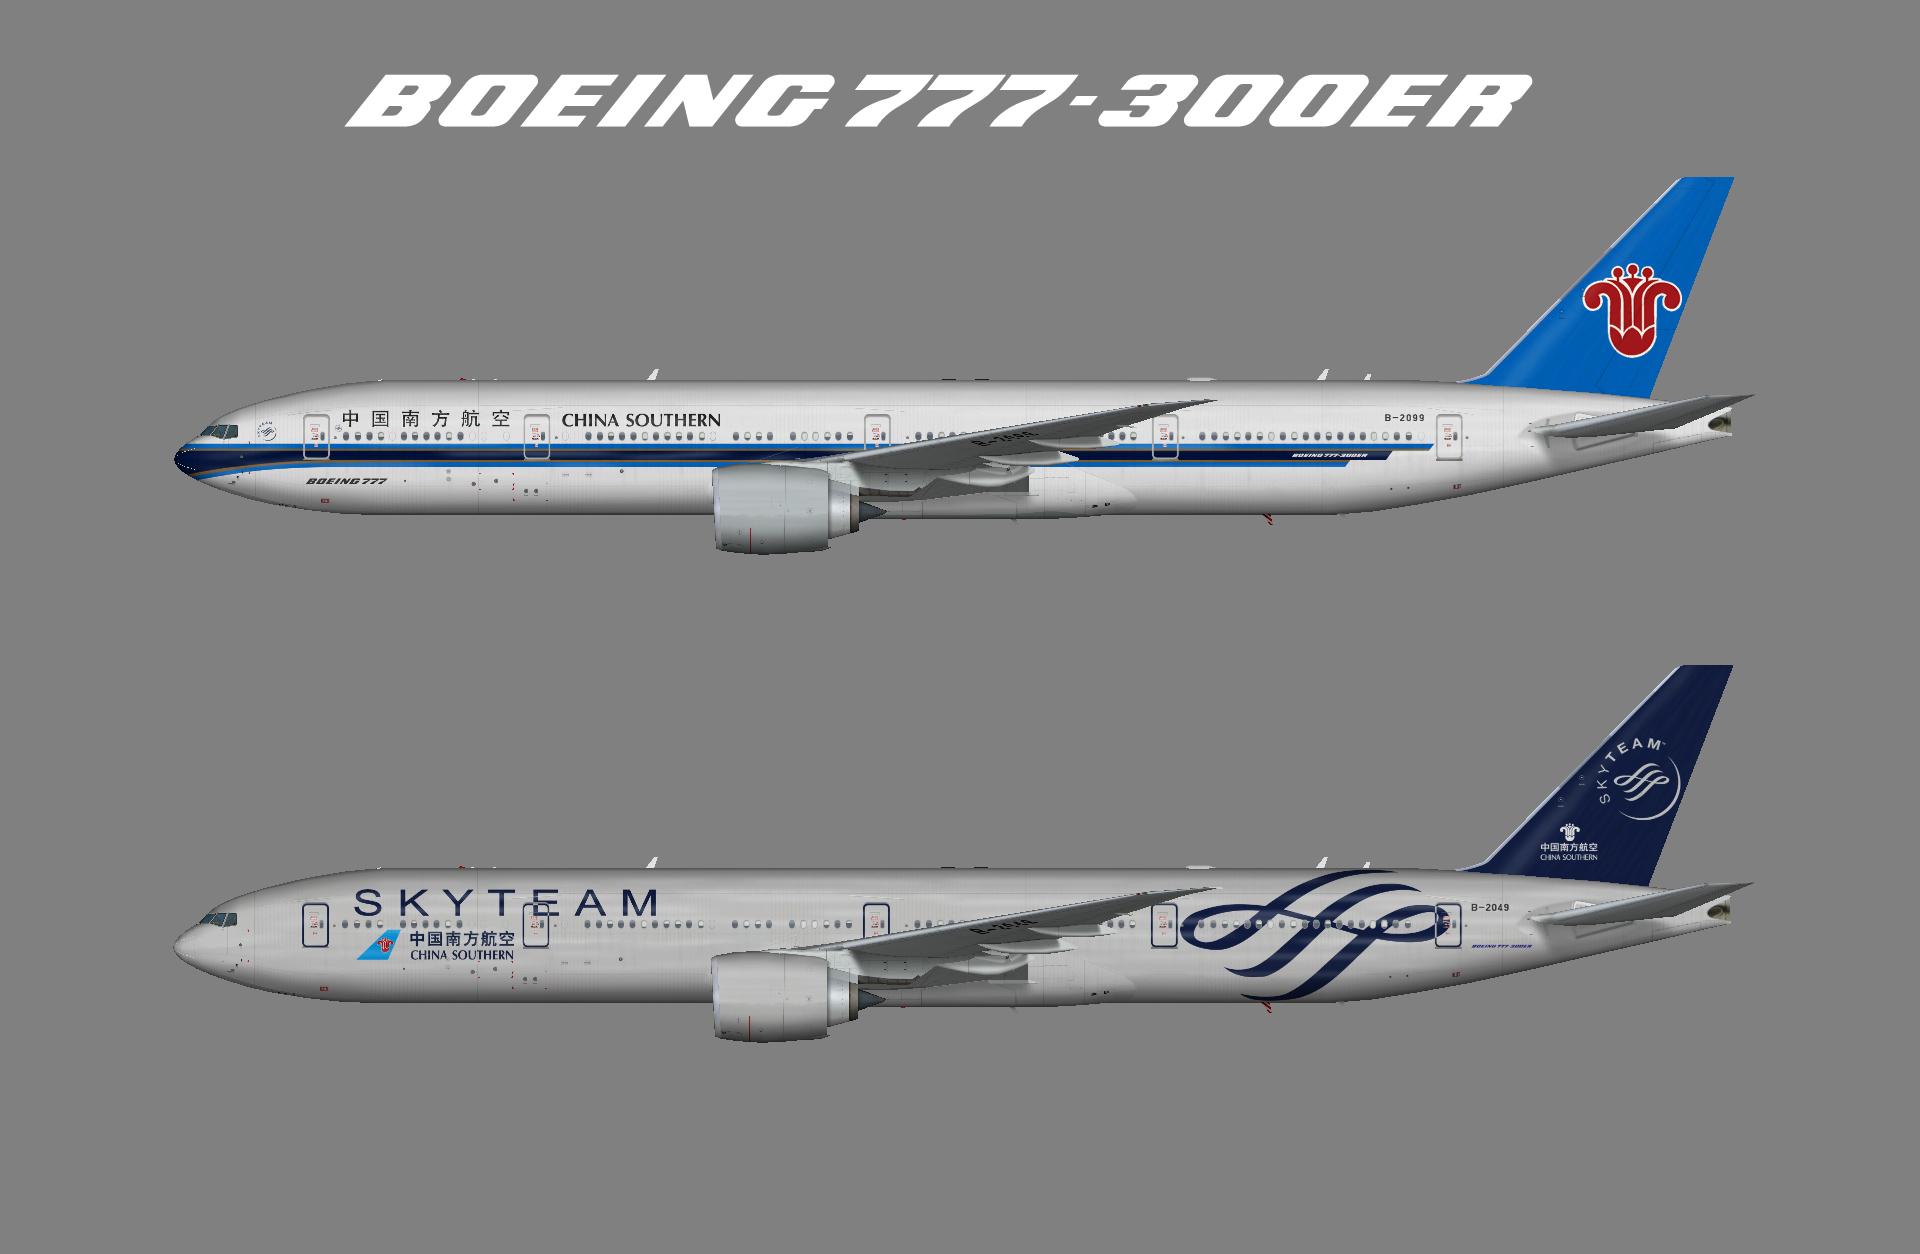 China Southern – Juergen's paint hangar